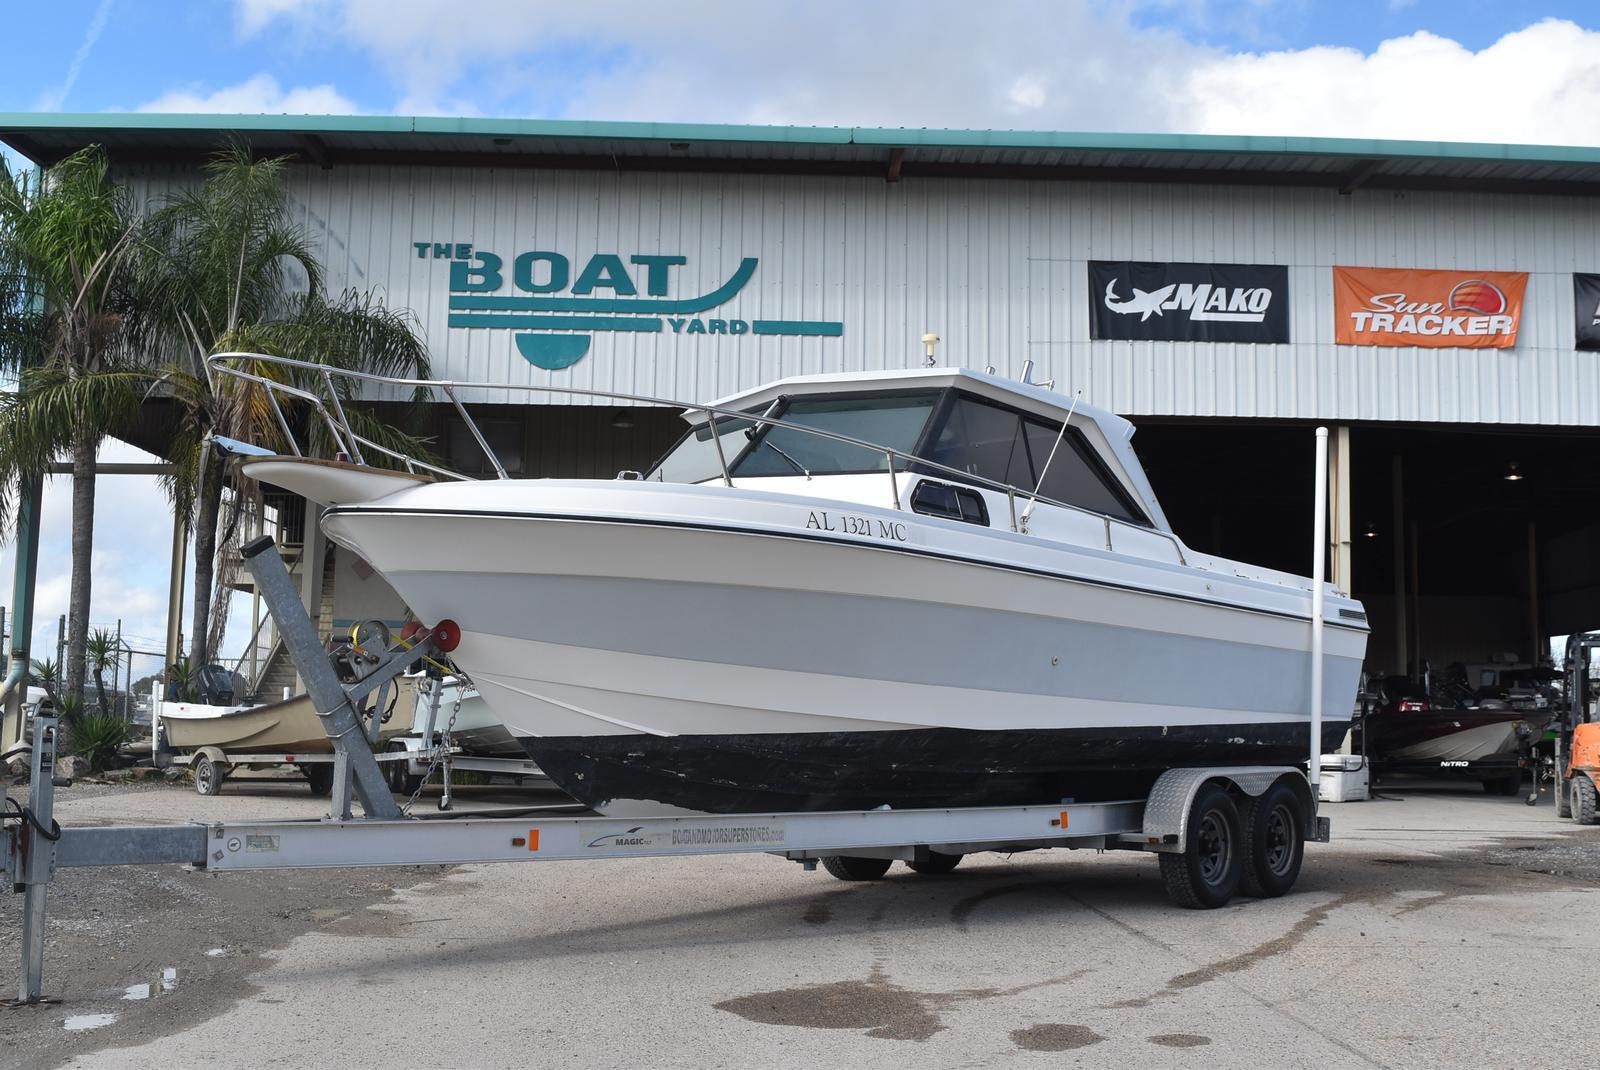 Inventory The Boat Yard Inc Marrero La 504 340 3175